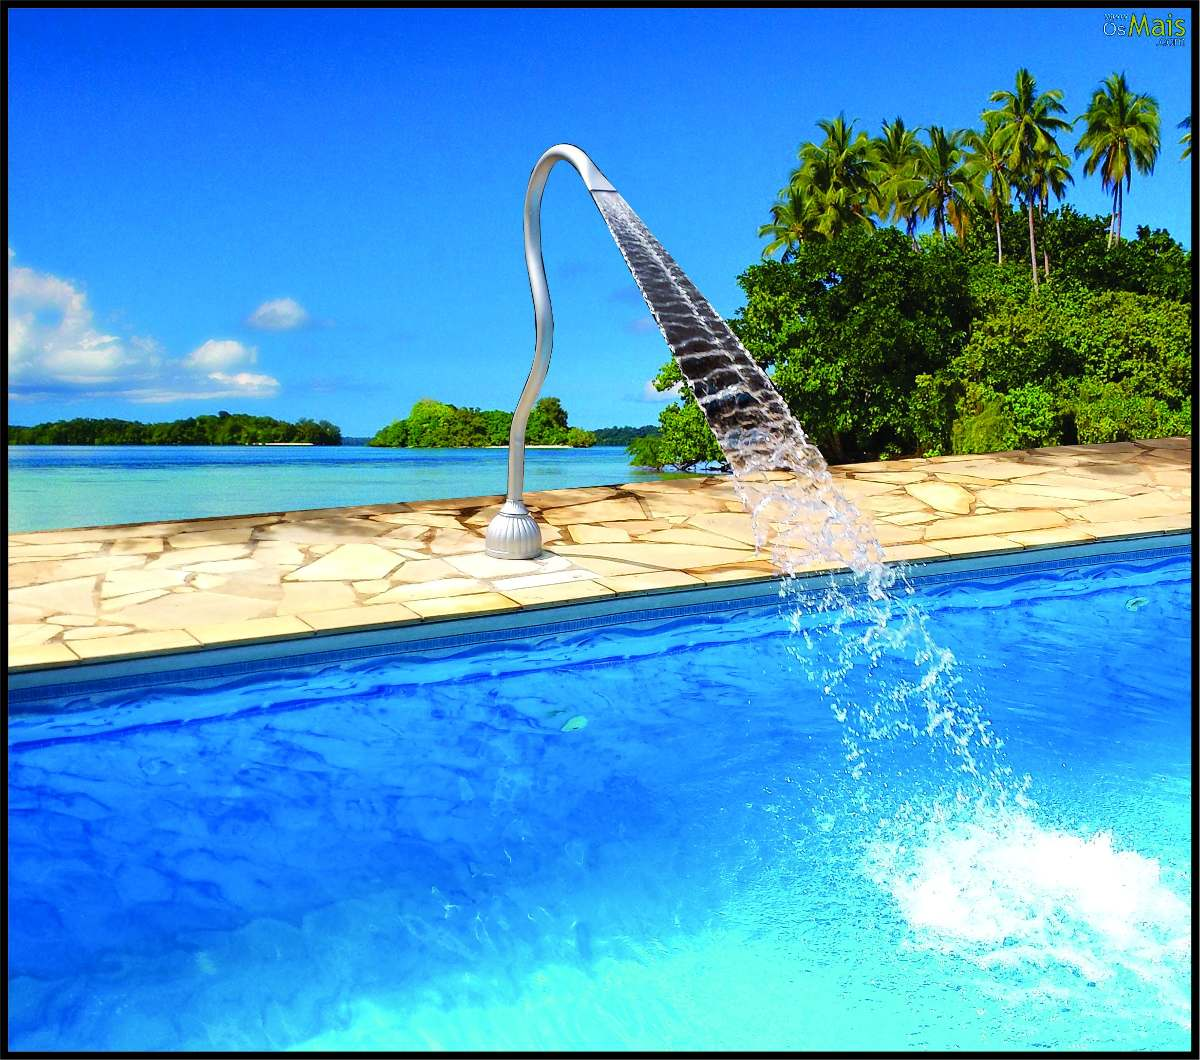 Linda cascata para piscina em pvc tubular frete gr tis r for Piscina tubular